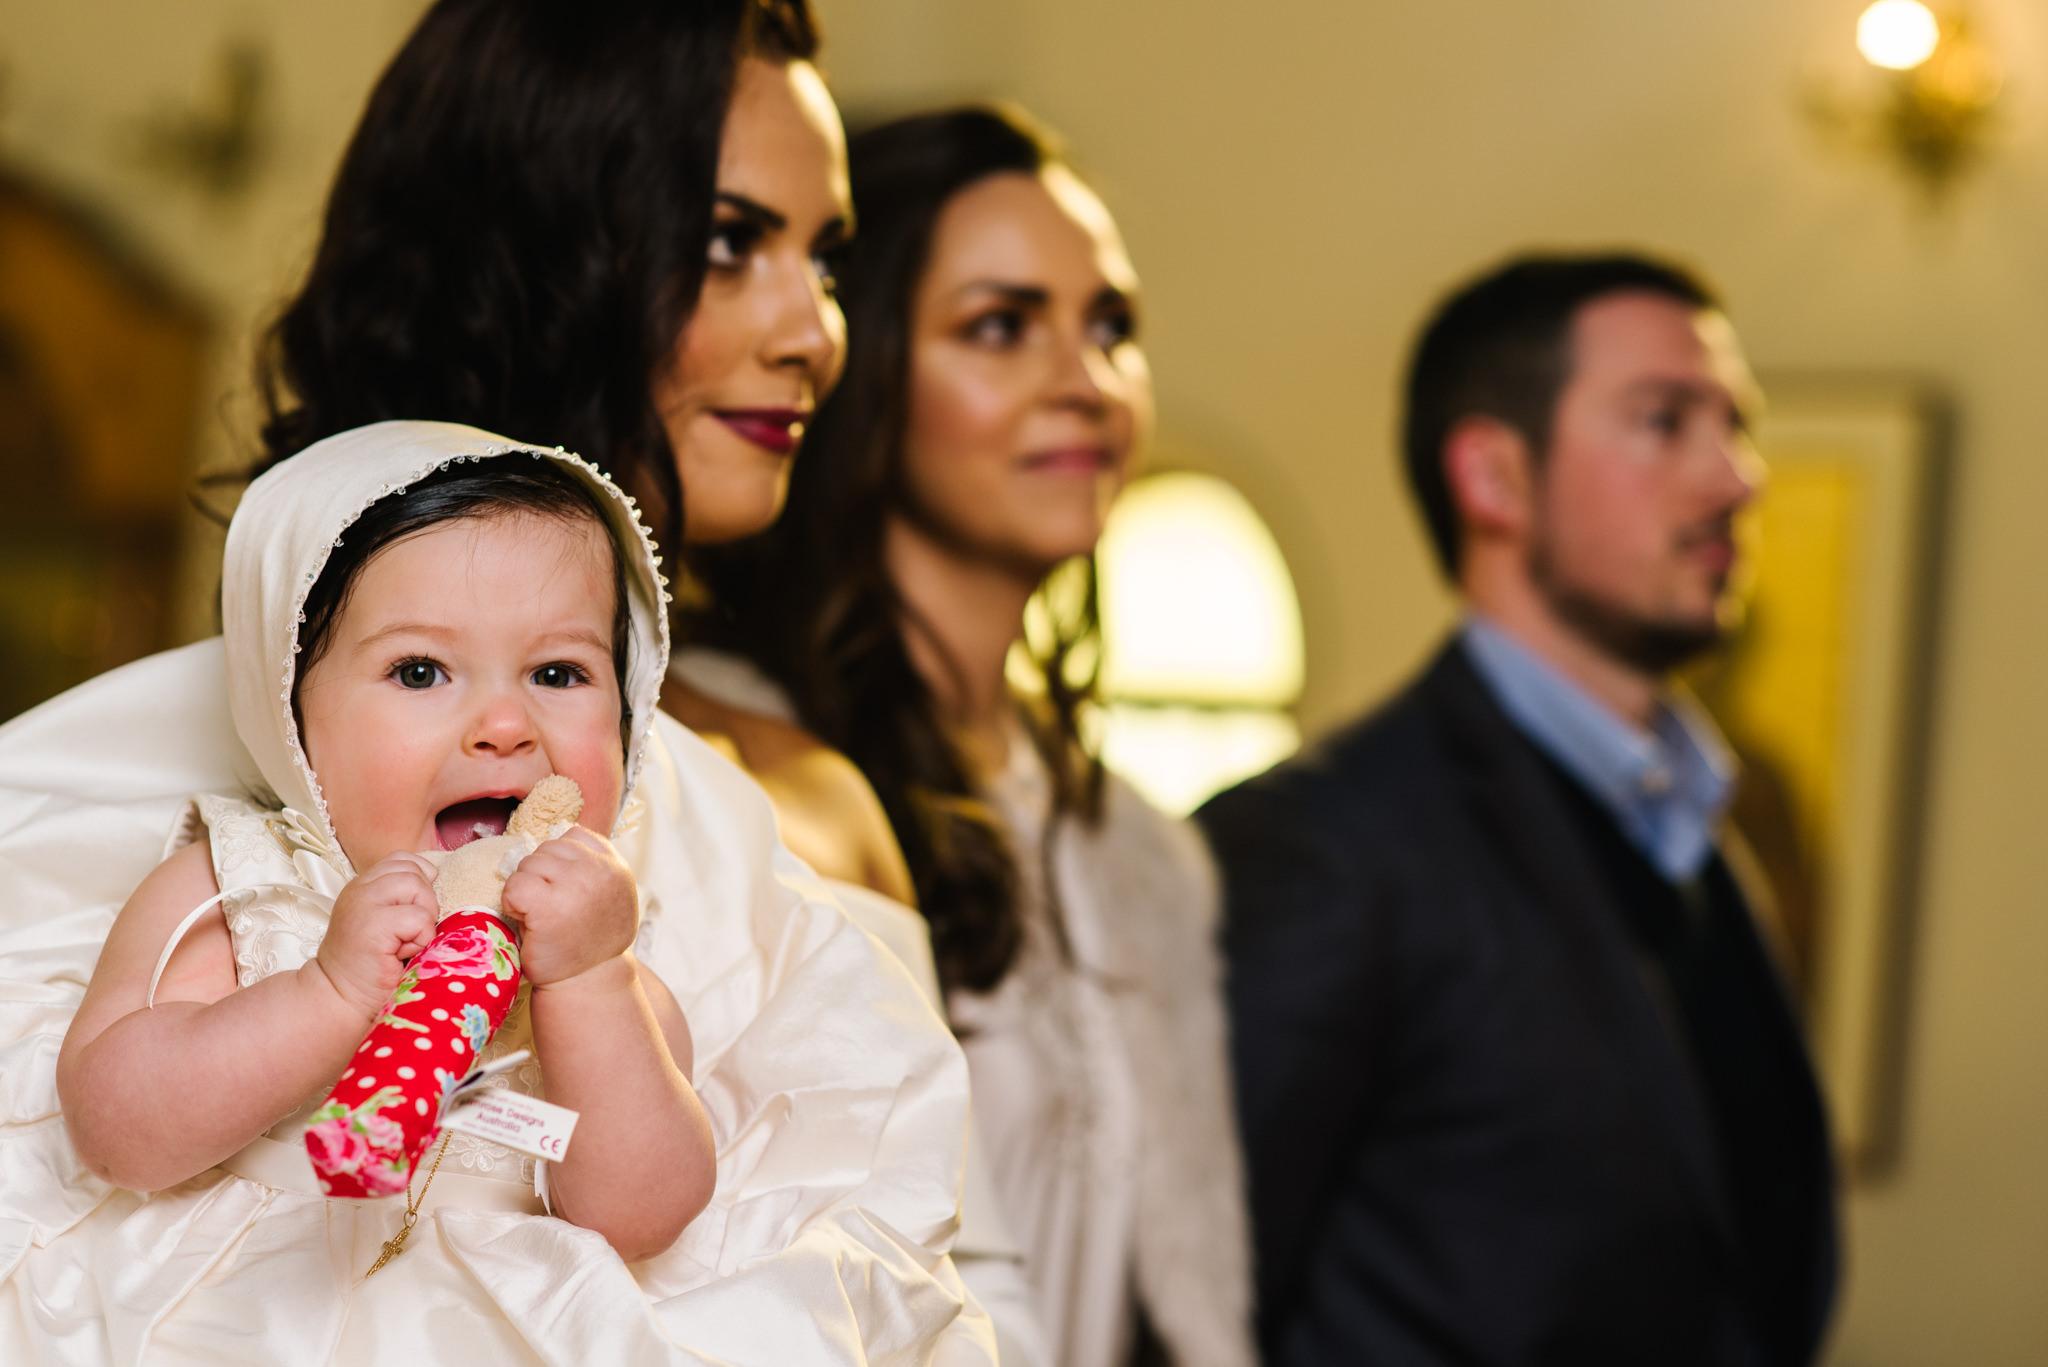 Cute baby christening photos.jpg